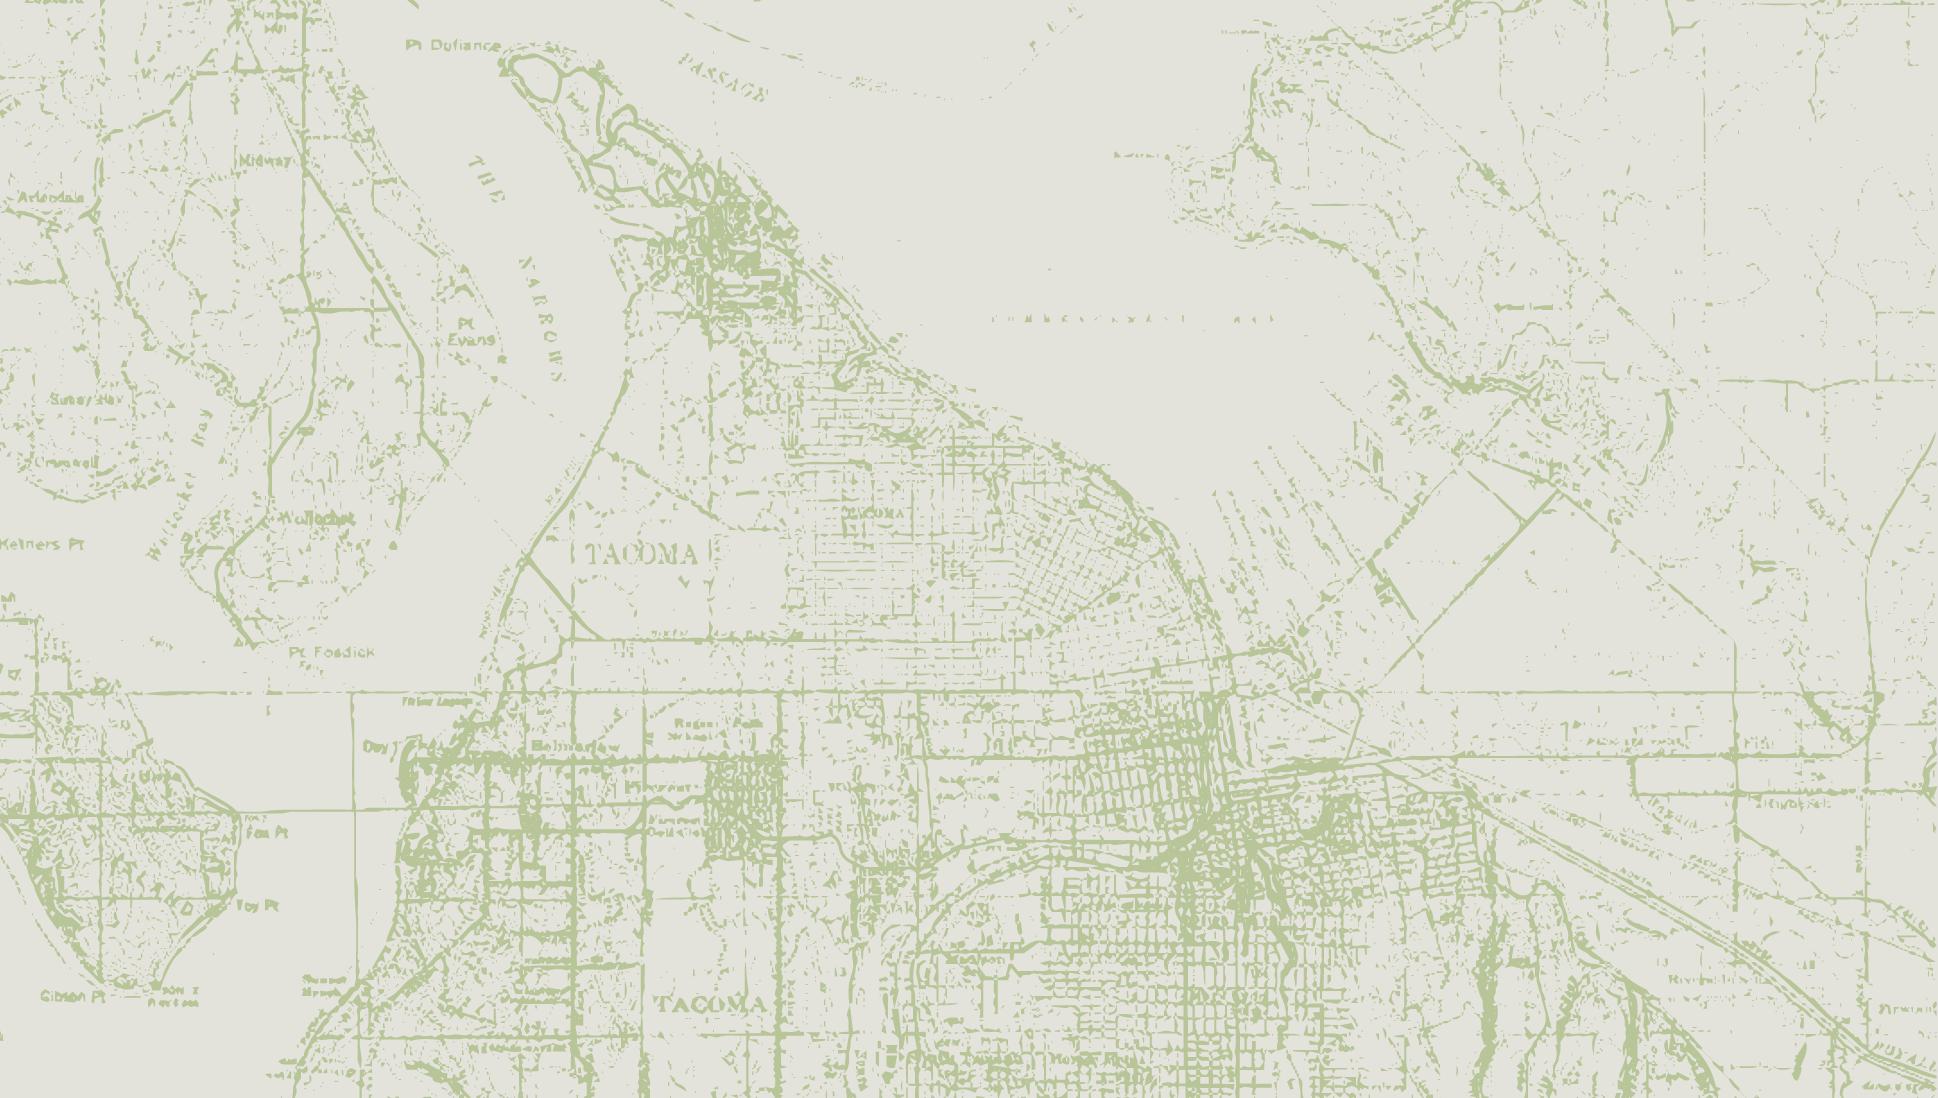 Map of Tacoma